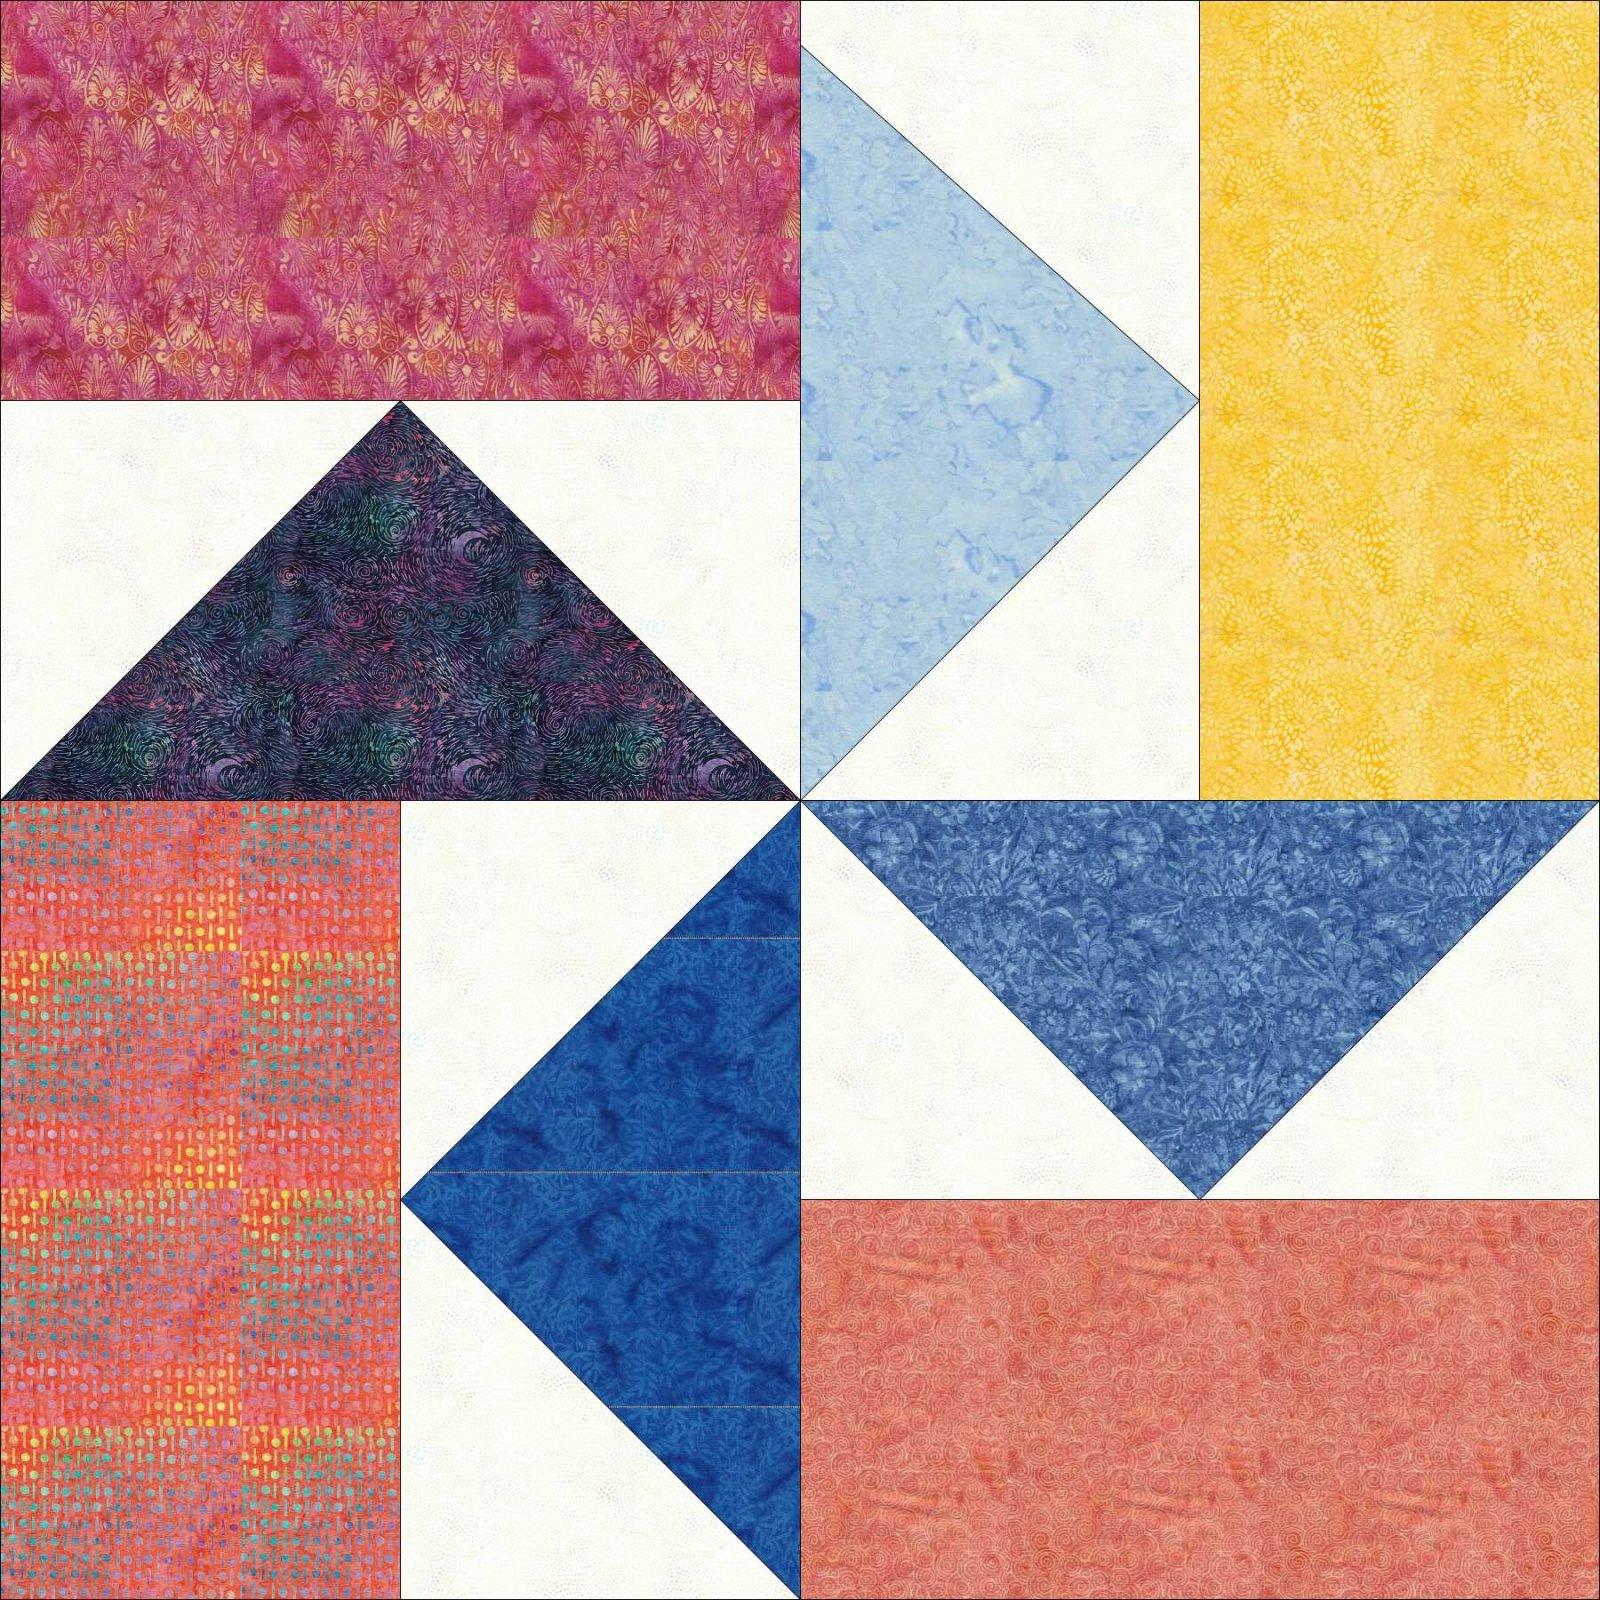 Sewing Sewcial 2021 Kindness Block